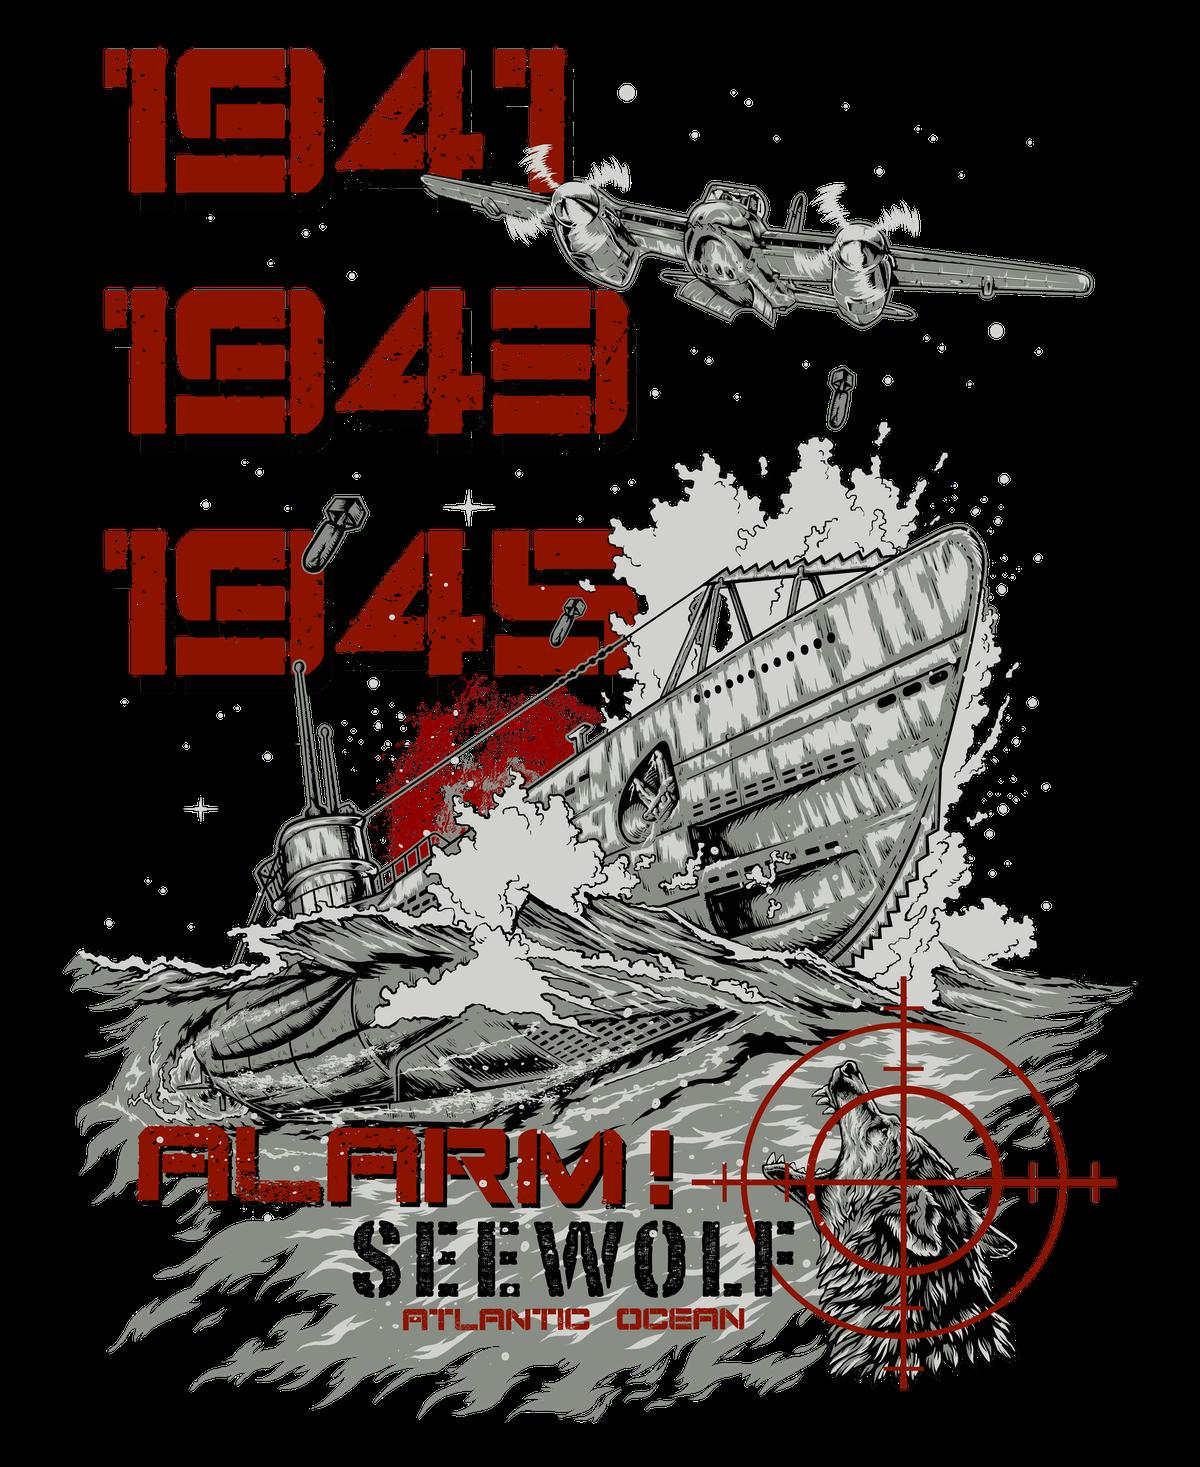 Alarm Seewolf